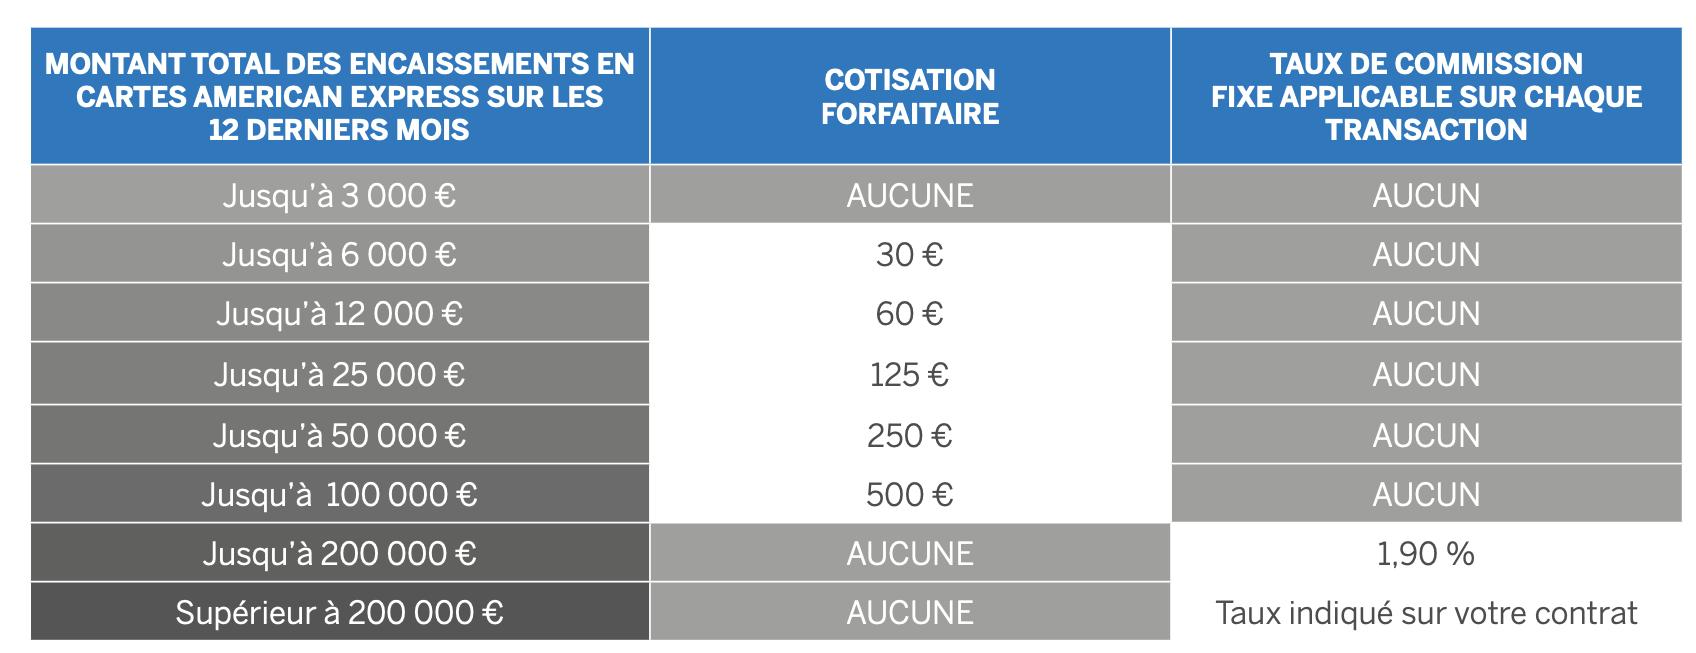 amex tarifs cotisation commission